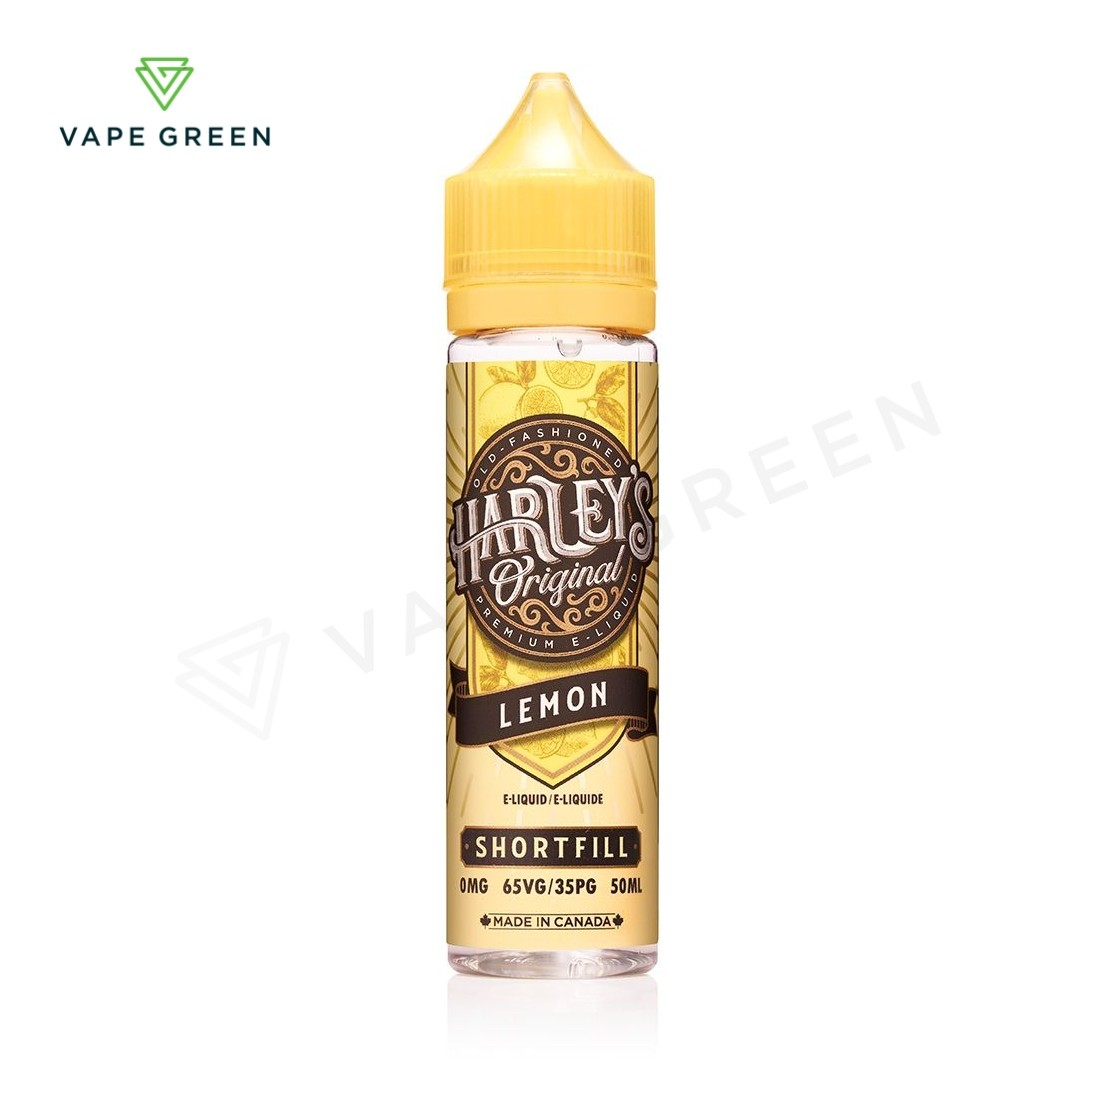 Lemon E-Liquid by Harley's Original 50ml